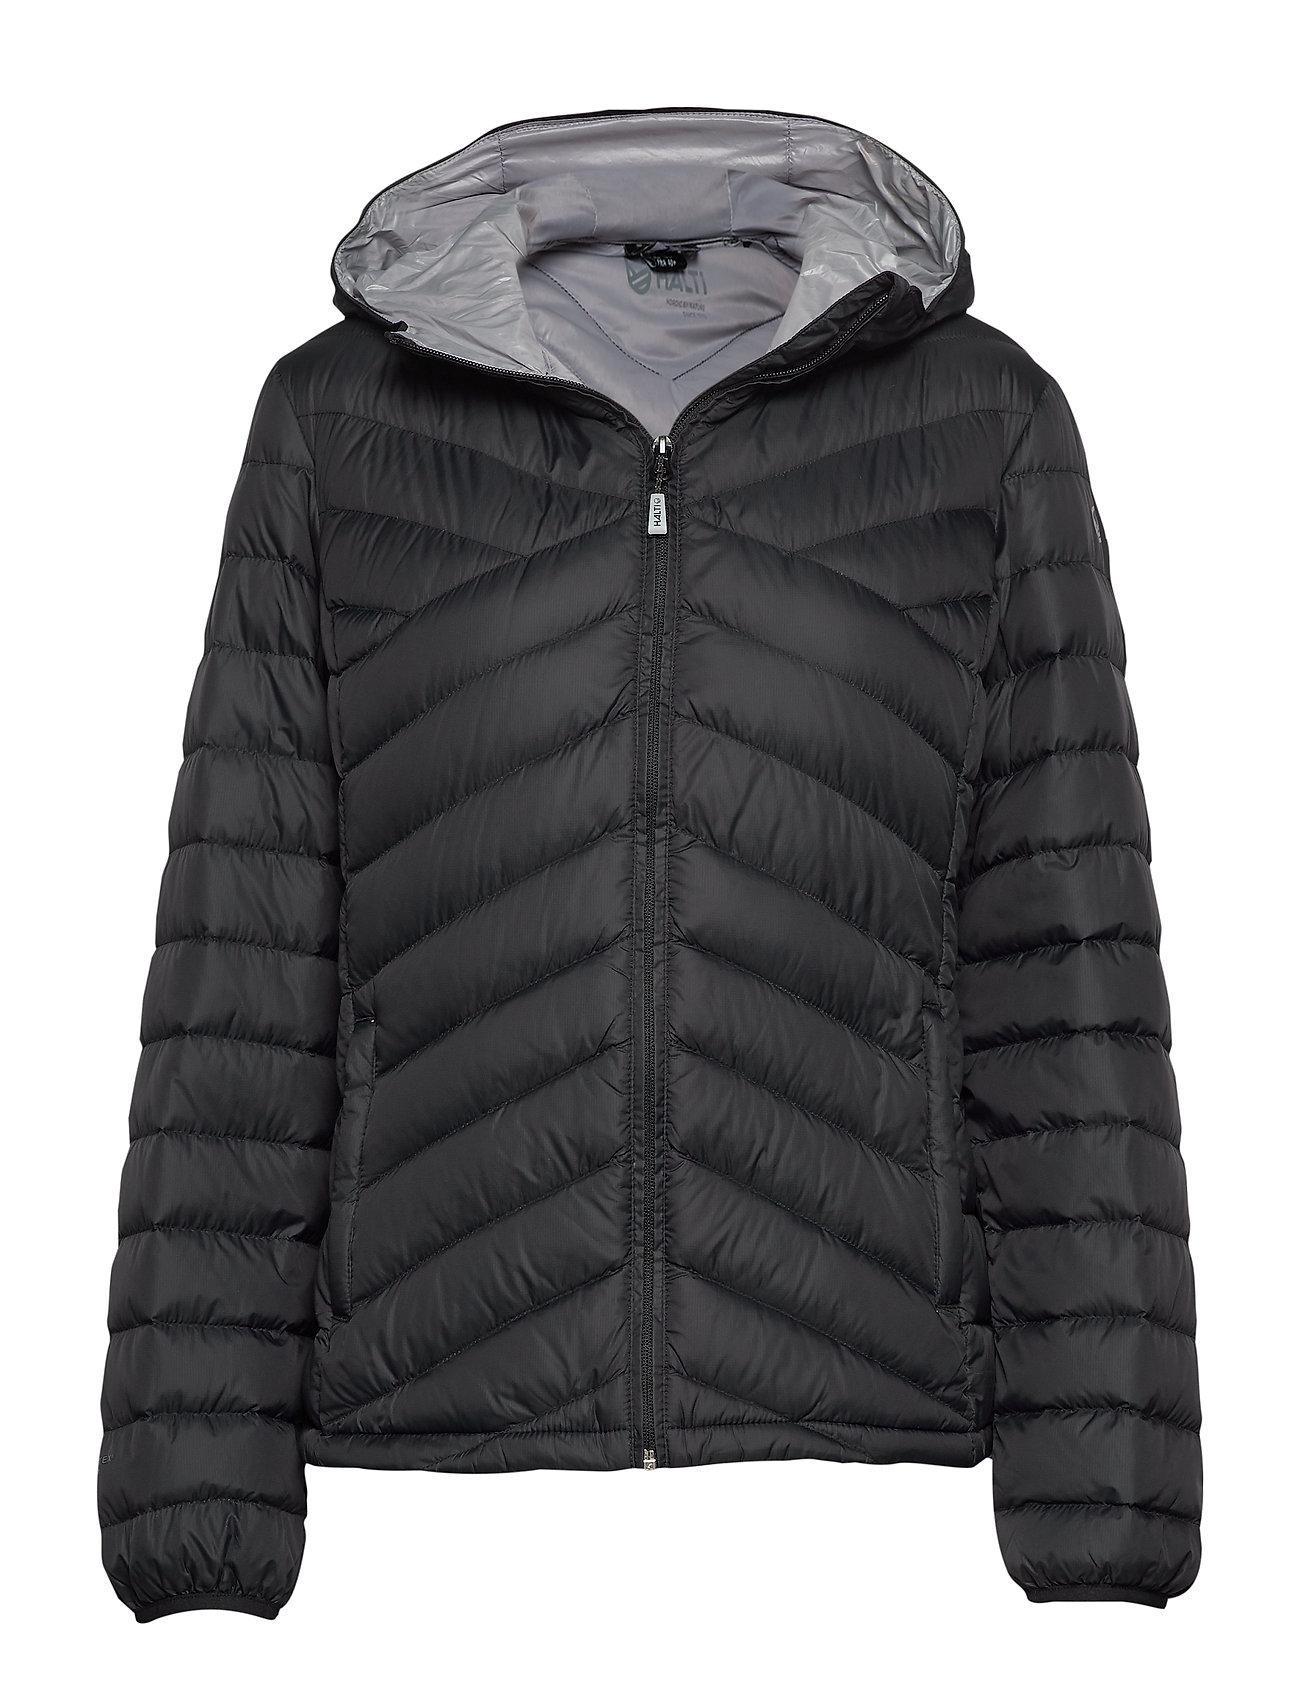 Halti Huippu W + Jacket - BLACK